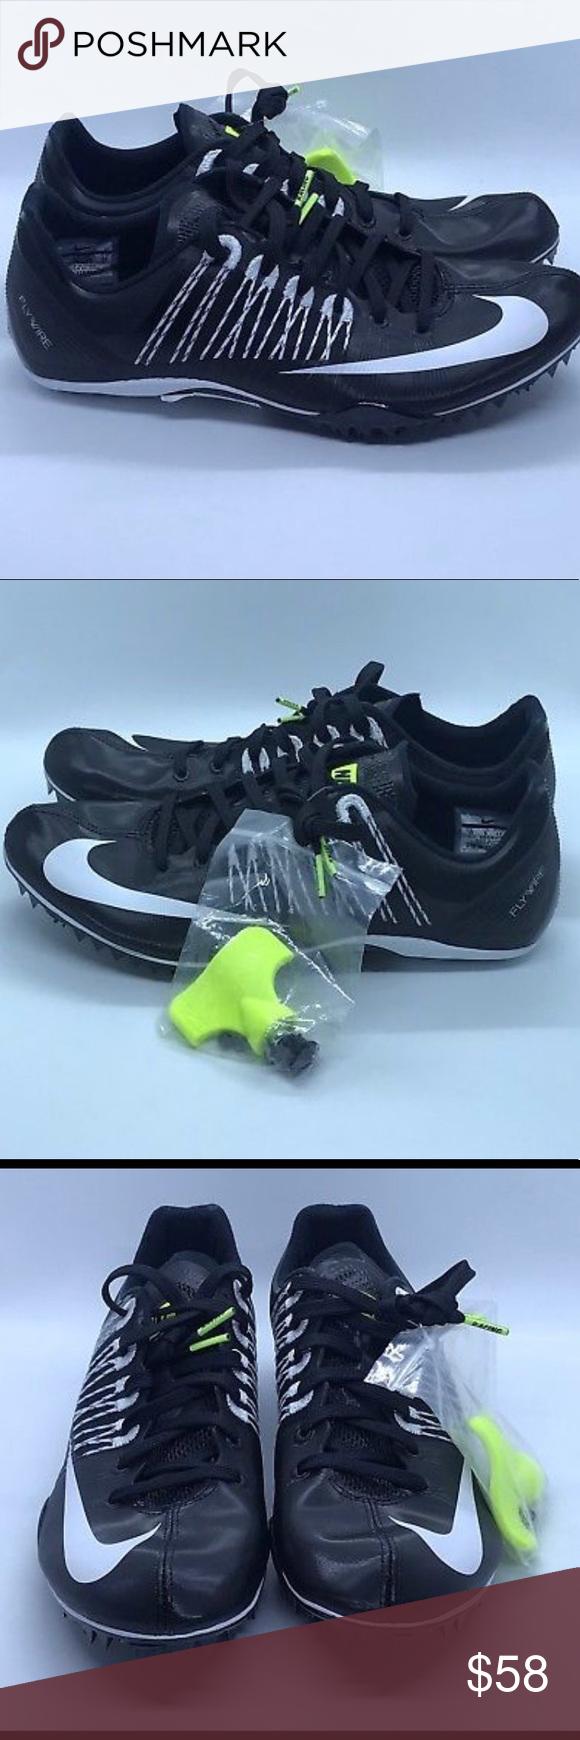 8e09255f5df Nike Zoom Celar 5 Spikes Black Size 12 629226-017 Brand  Nike Zoom Celar